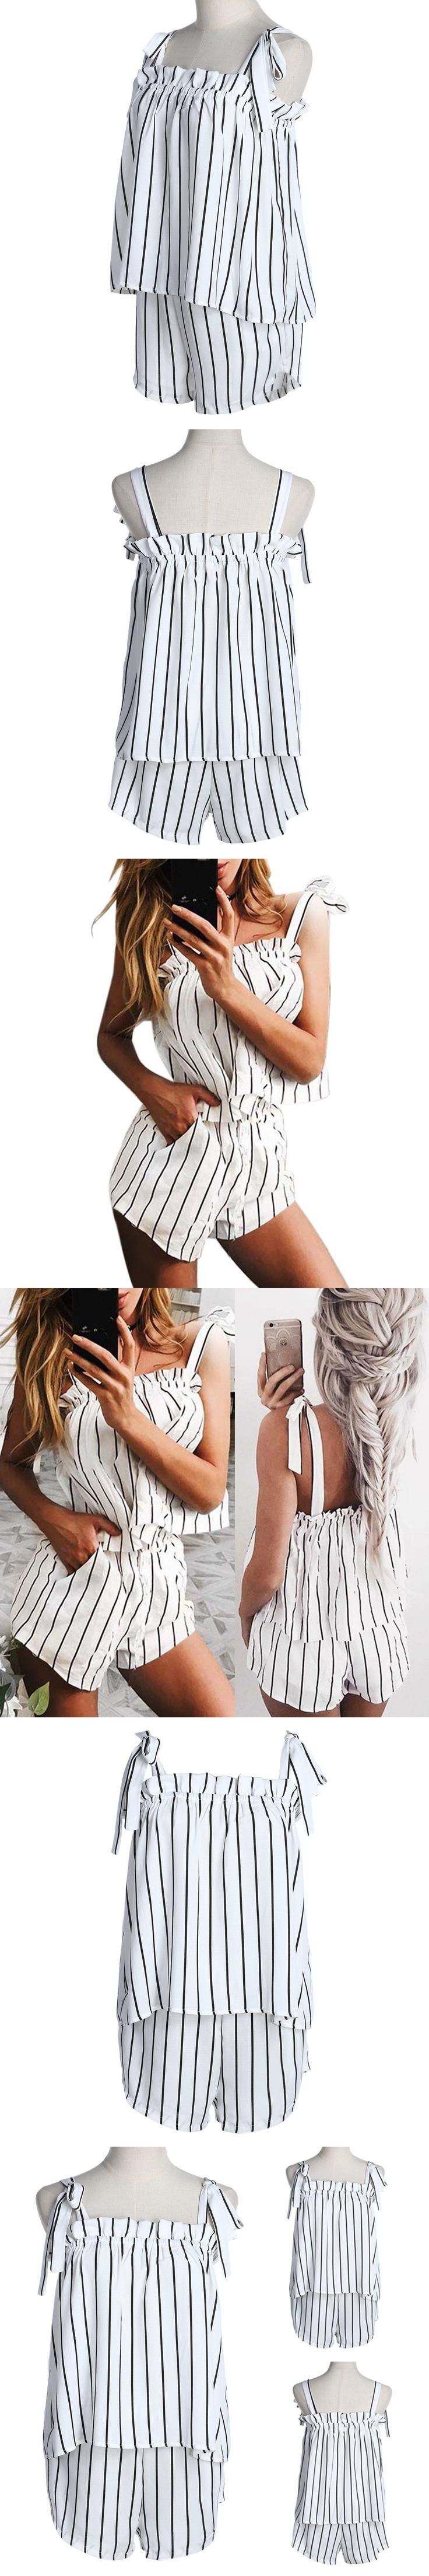 2018 Women's Elegant Stripe Jumpsuit Romper Off Shoulder 2pcs uit White Bow Sexy Summer Beach Playsuit Outfit